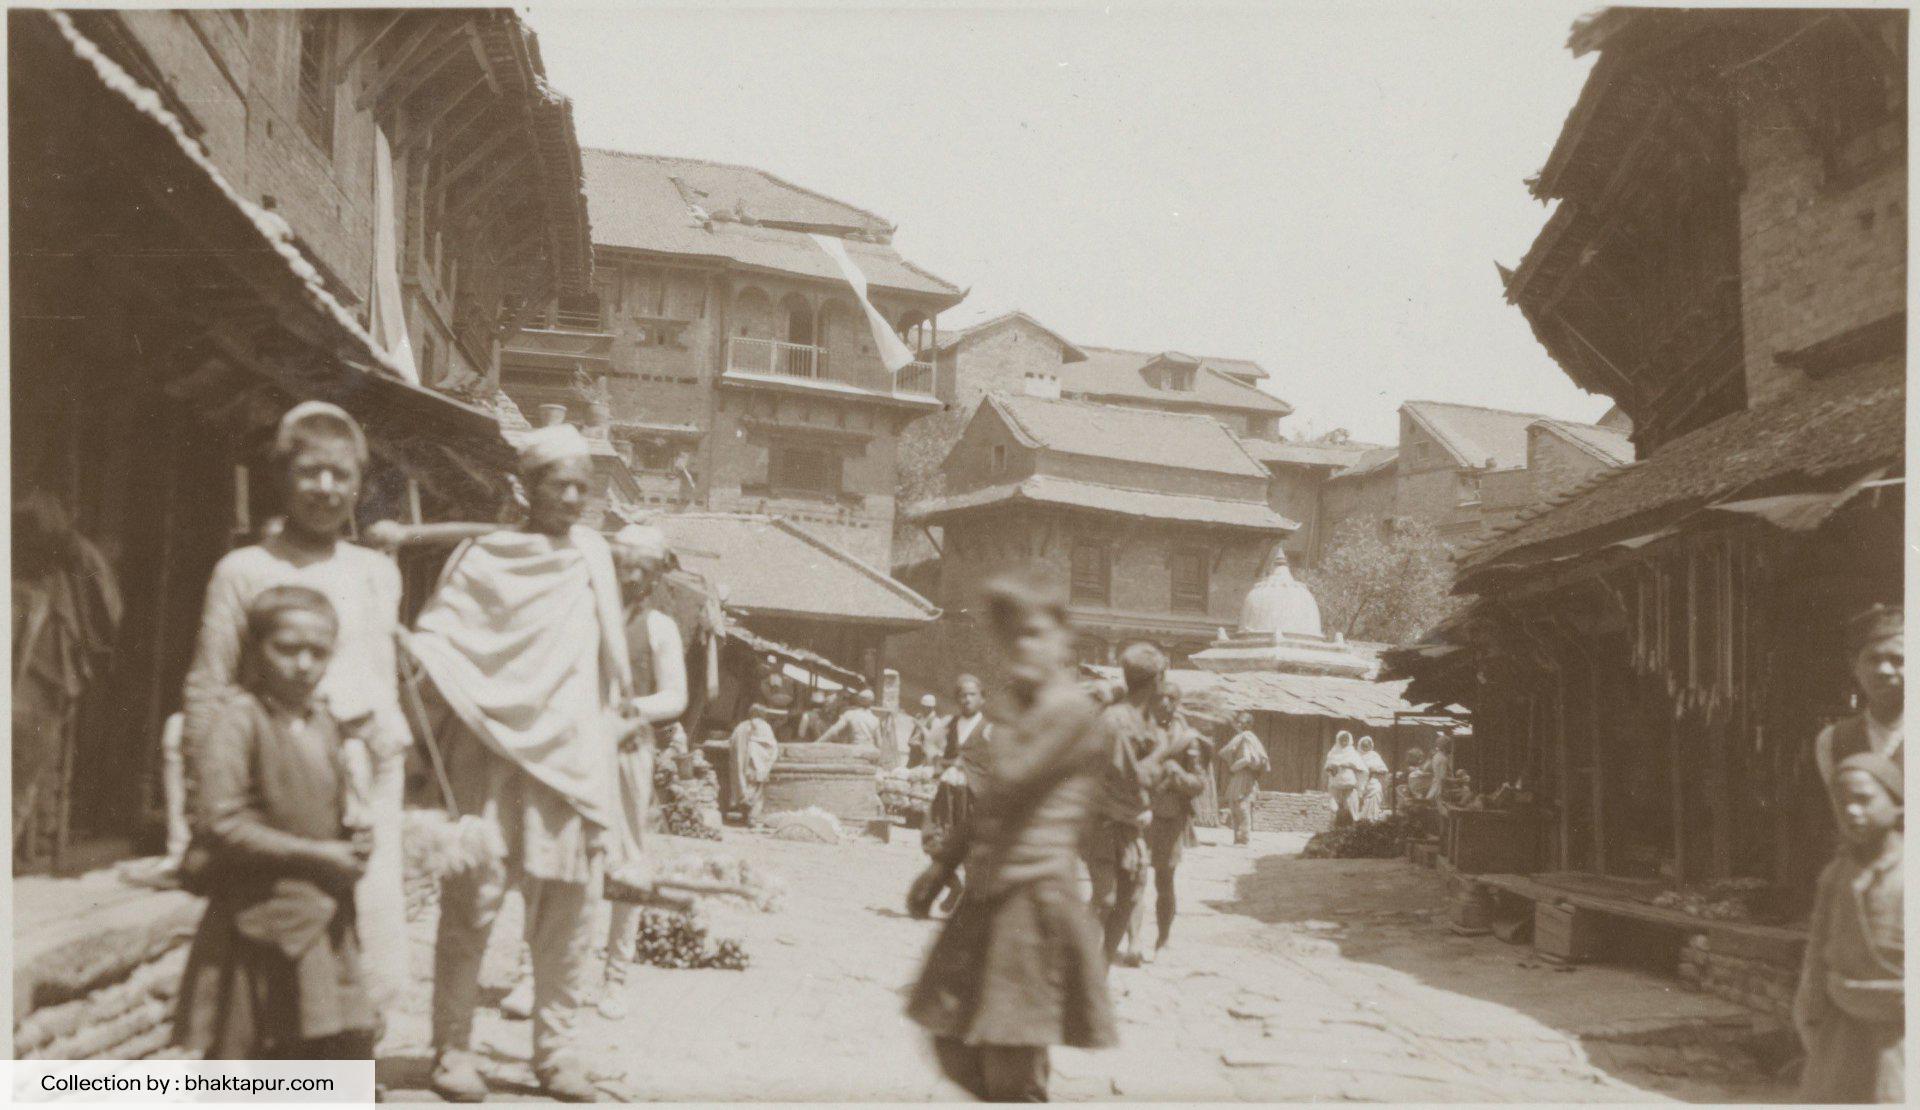 https://www.bhaktapur.com/wp-content/uploads/2021/01/sukuldhokaa.jpg